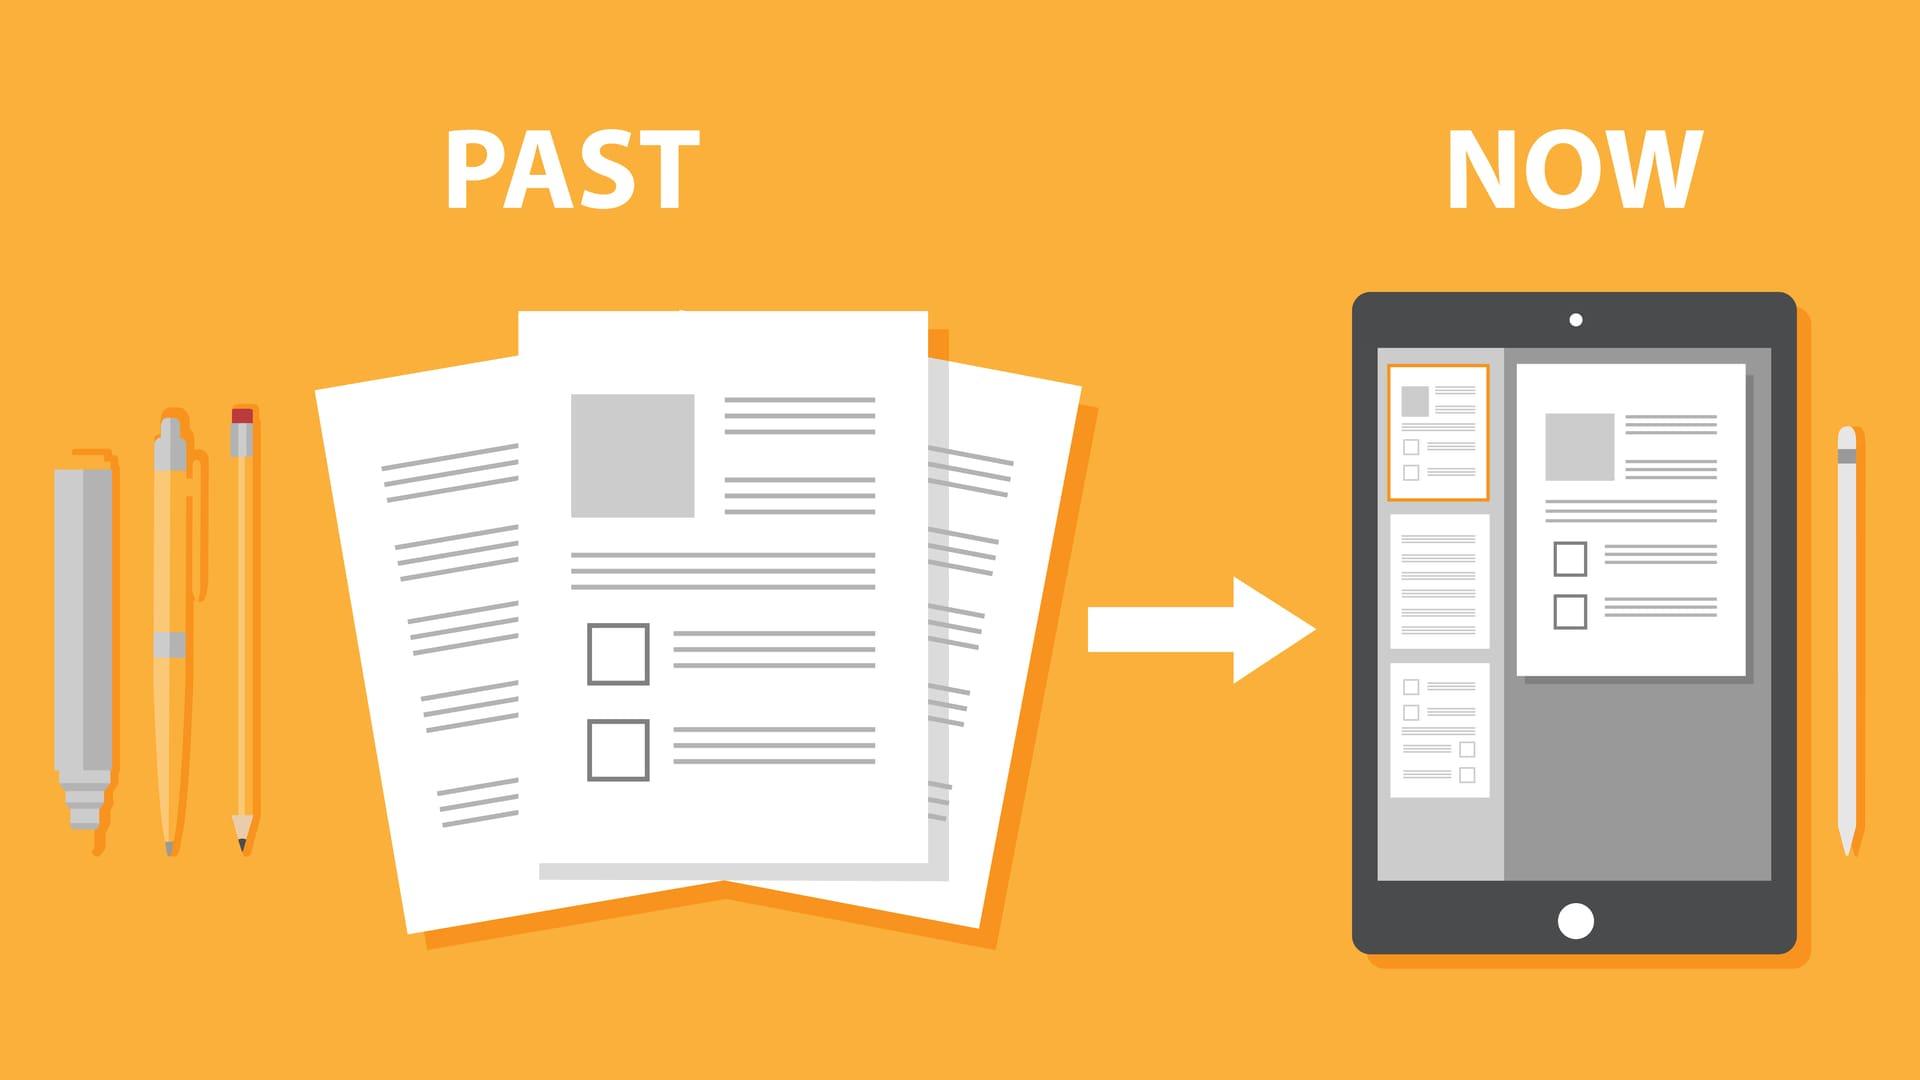 iPad(タブレット)で介護記録を作成するメリット・デメリット【おすすめソフトも紹介します】